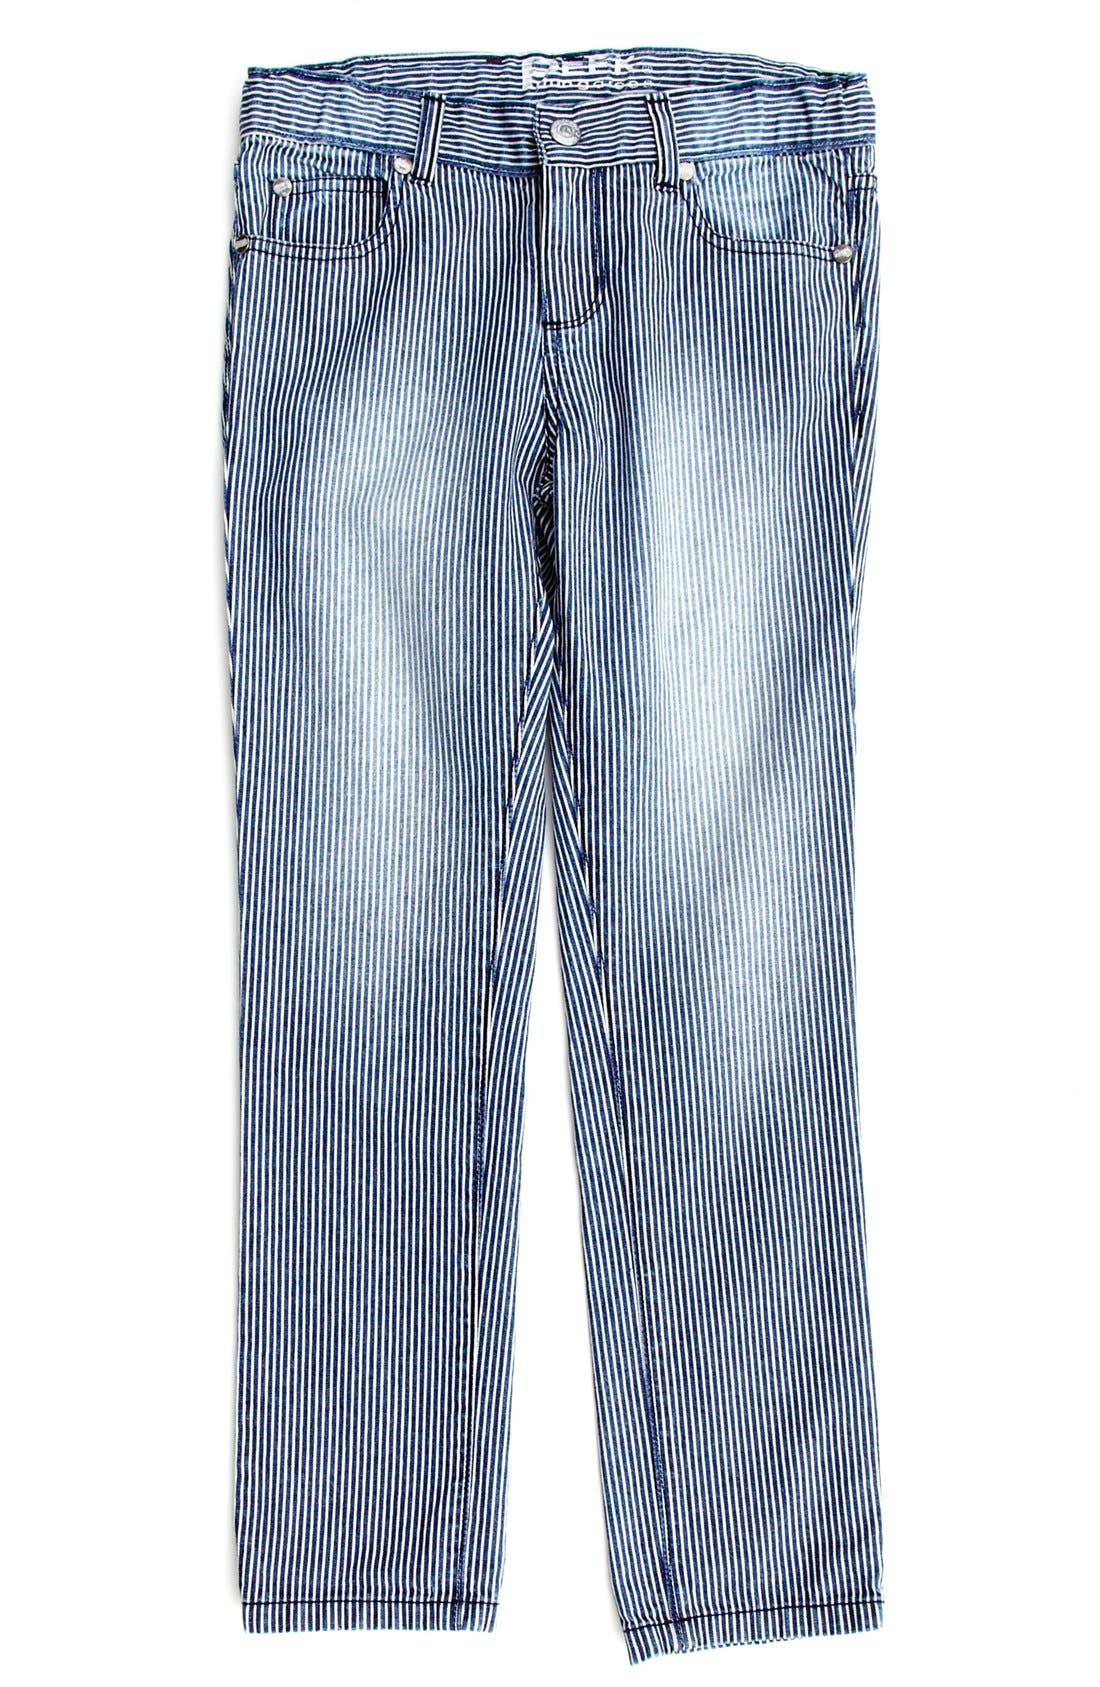 Alternate Image 2  - Peek 'Margot' Railroad Stripe Skinny Jeans (Toddler Girls, Little Girls & Big Girls)